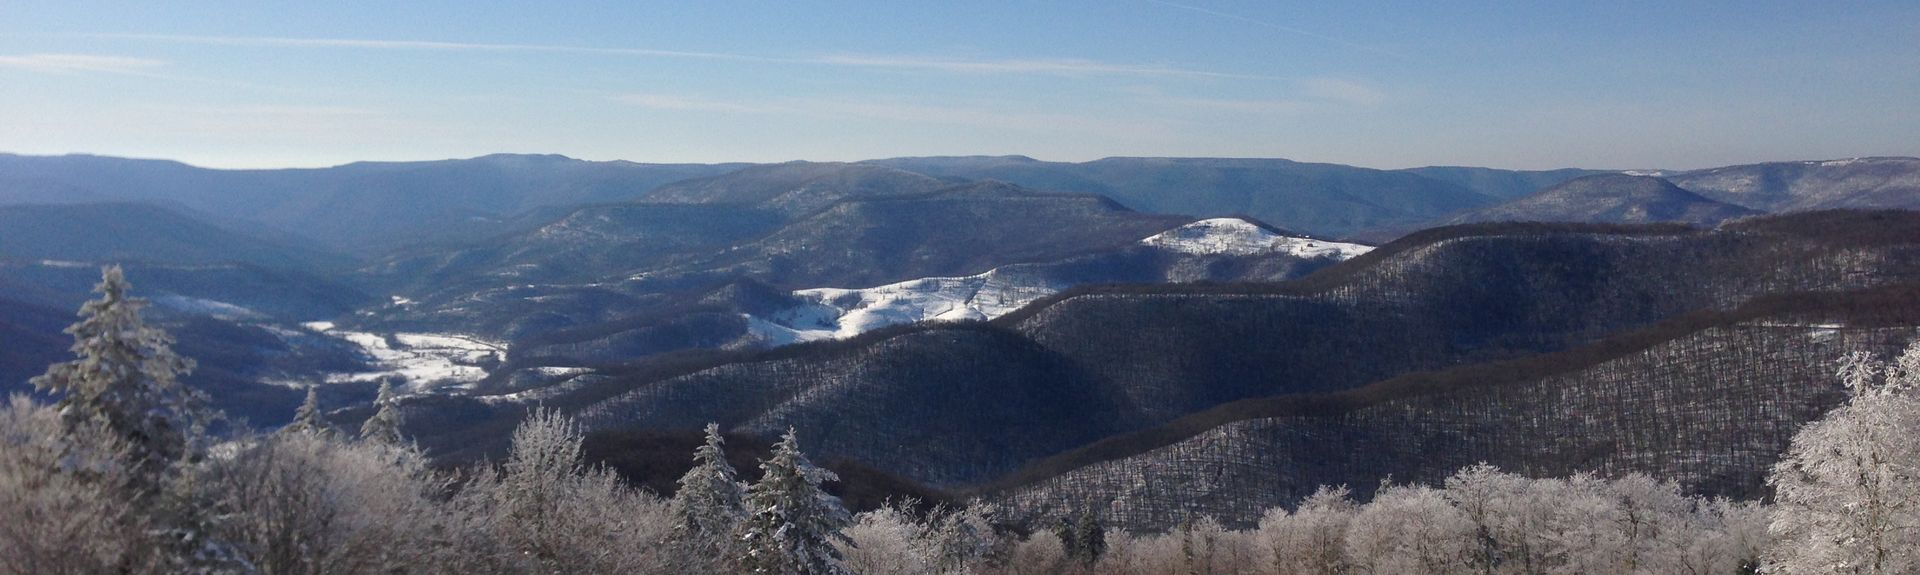 Soaring Eagle (Snowshoe, West Virginia, United States)